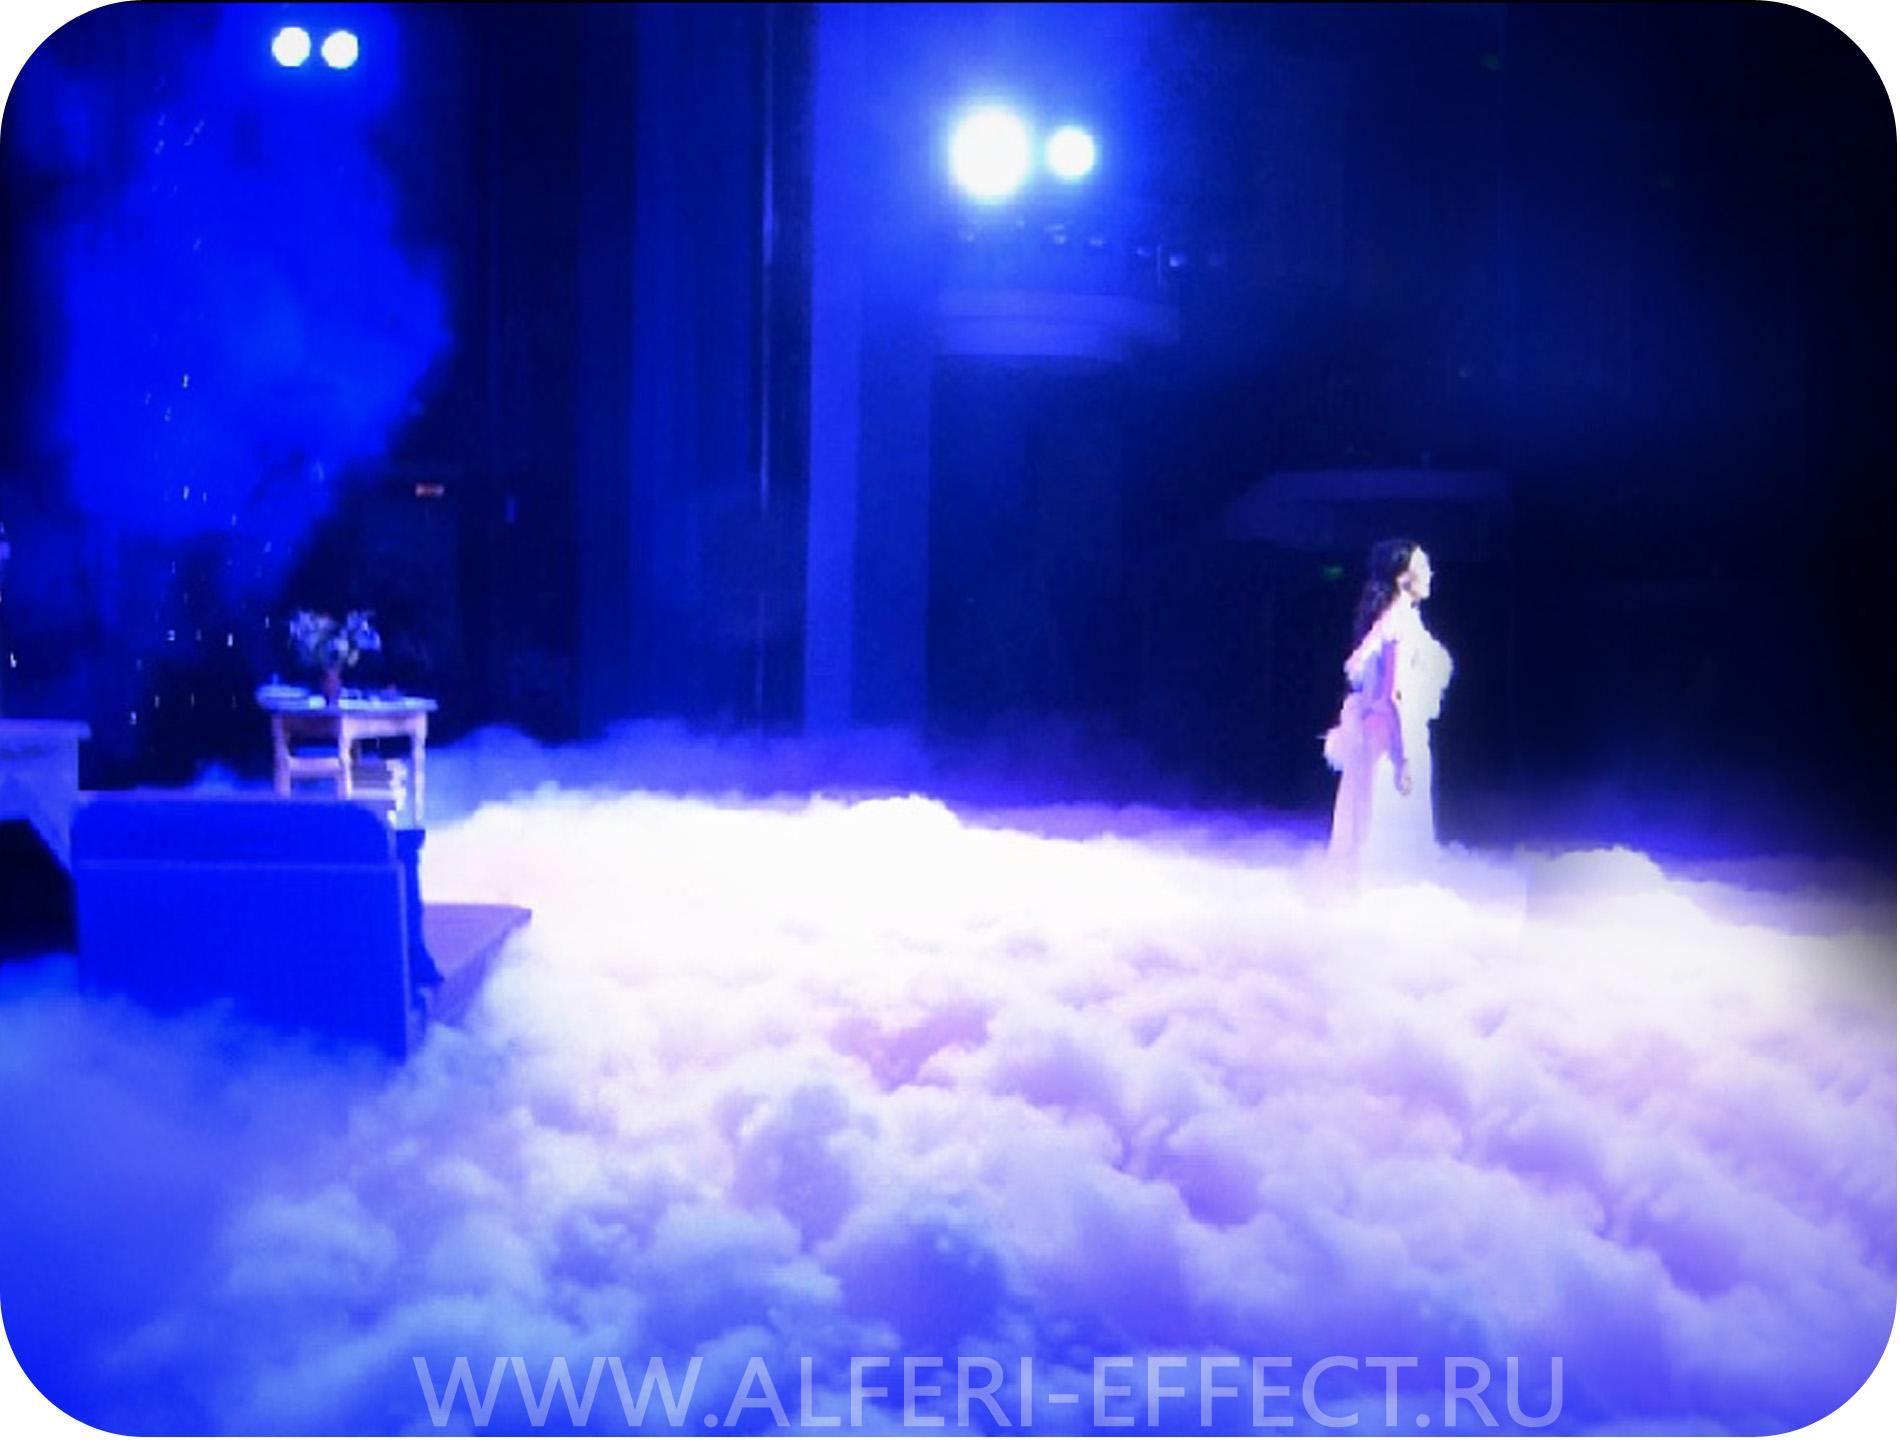 Мюзикл - Безымянная звезда, тяжелый дым Альфери Эффект